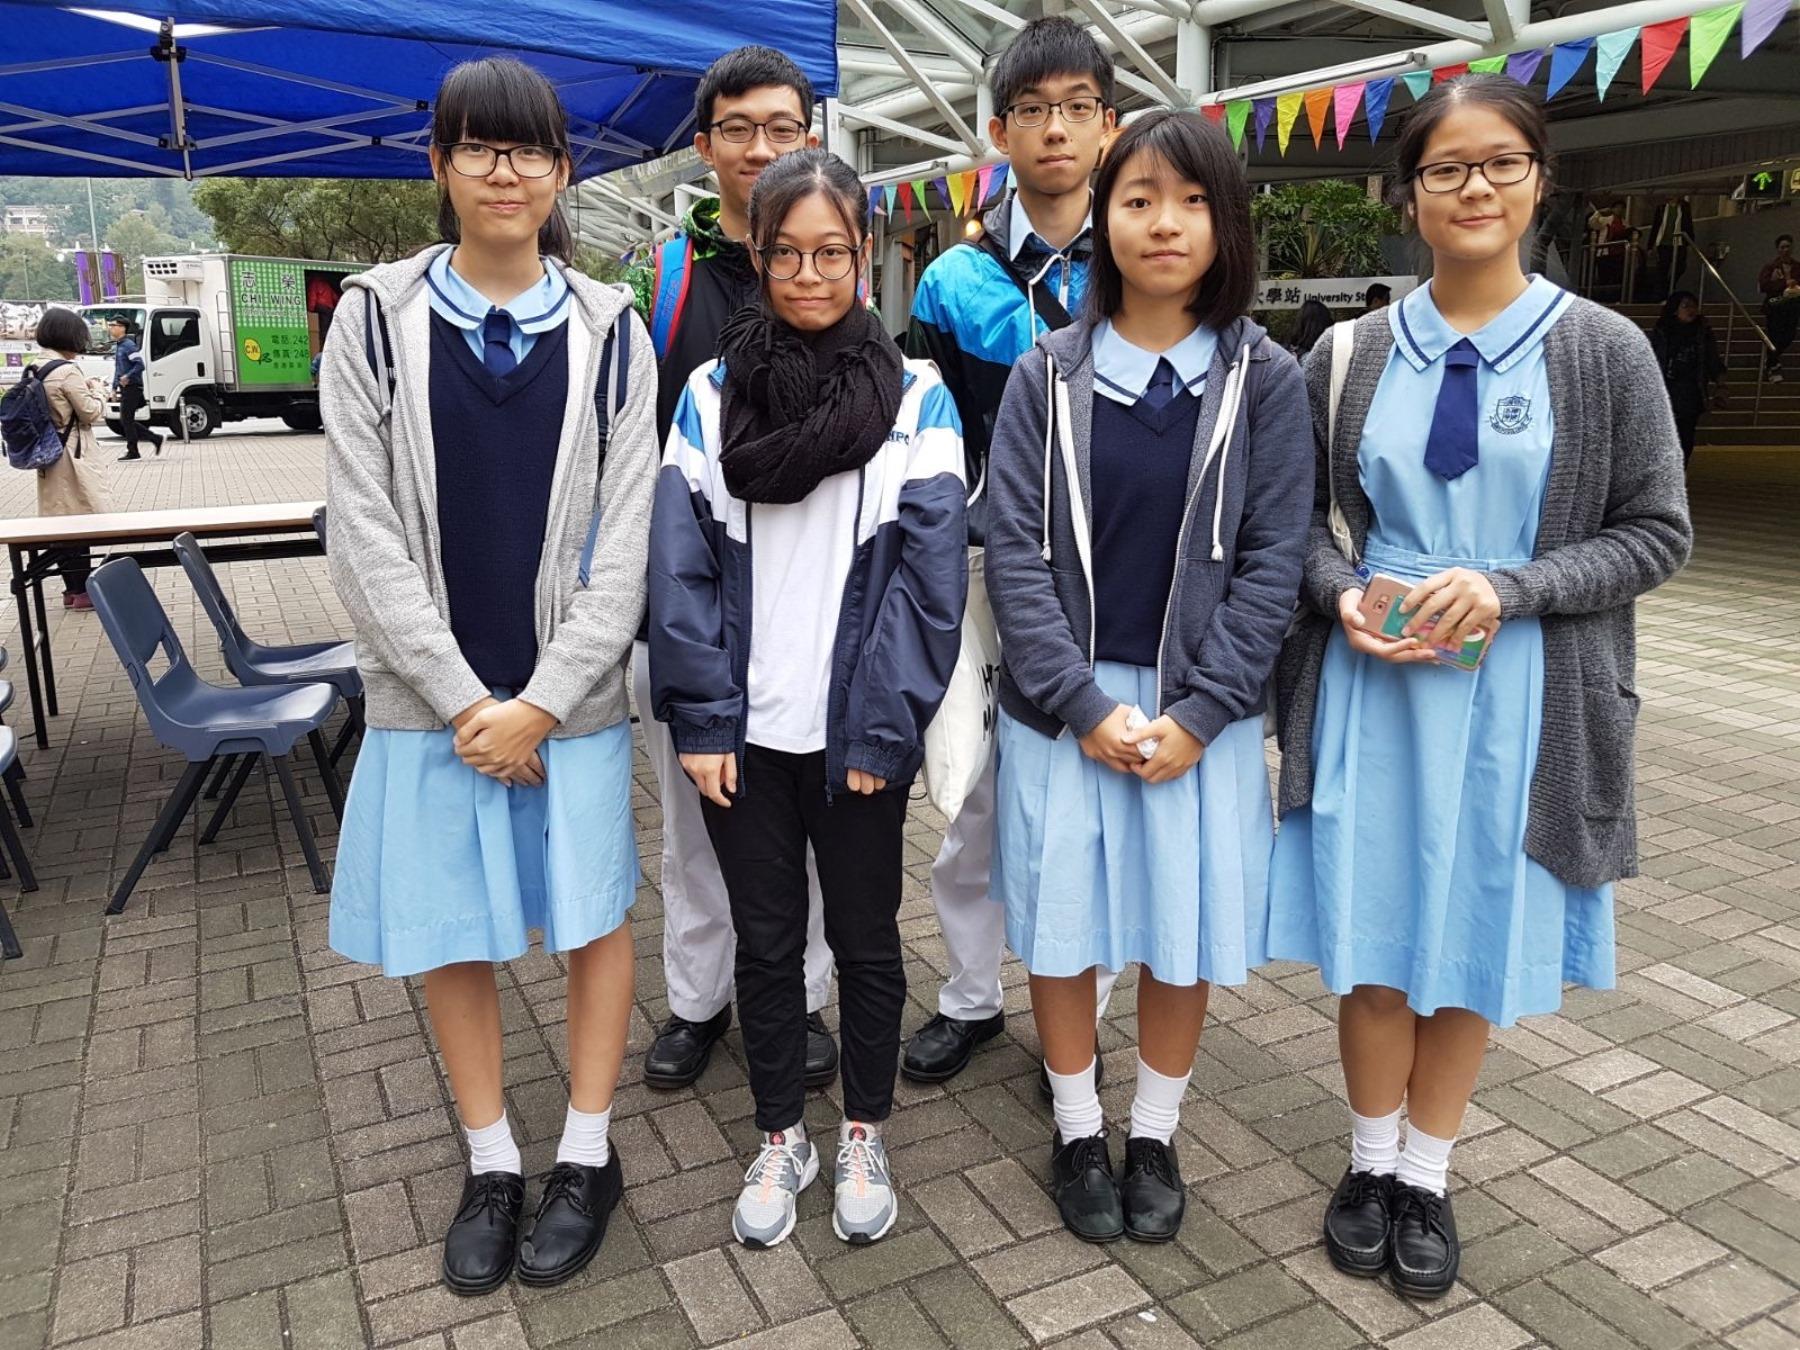 http://npc.edu.hk/sites/default/files/01_7.jpg